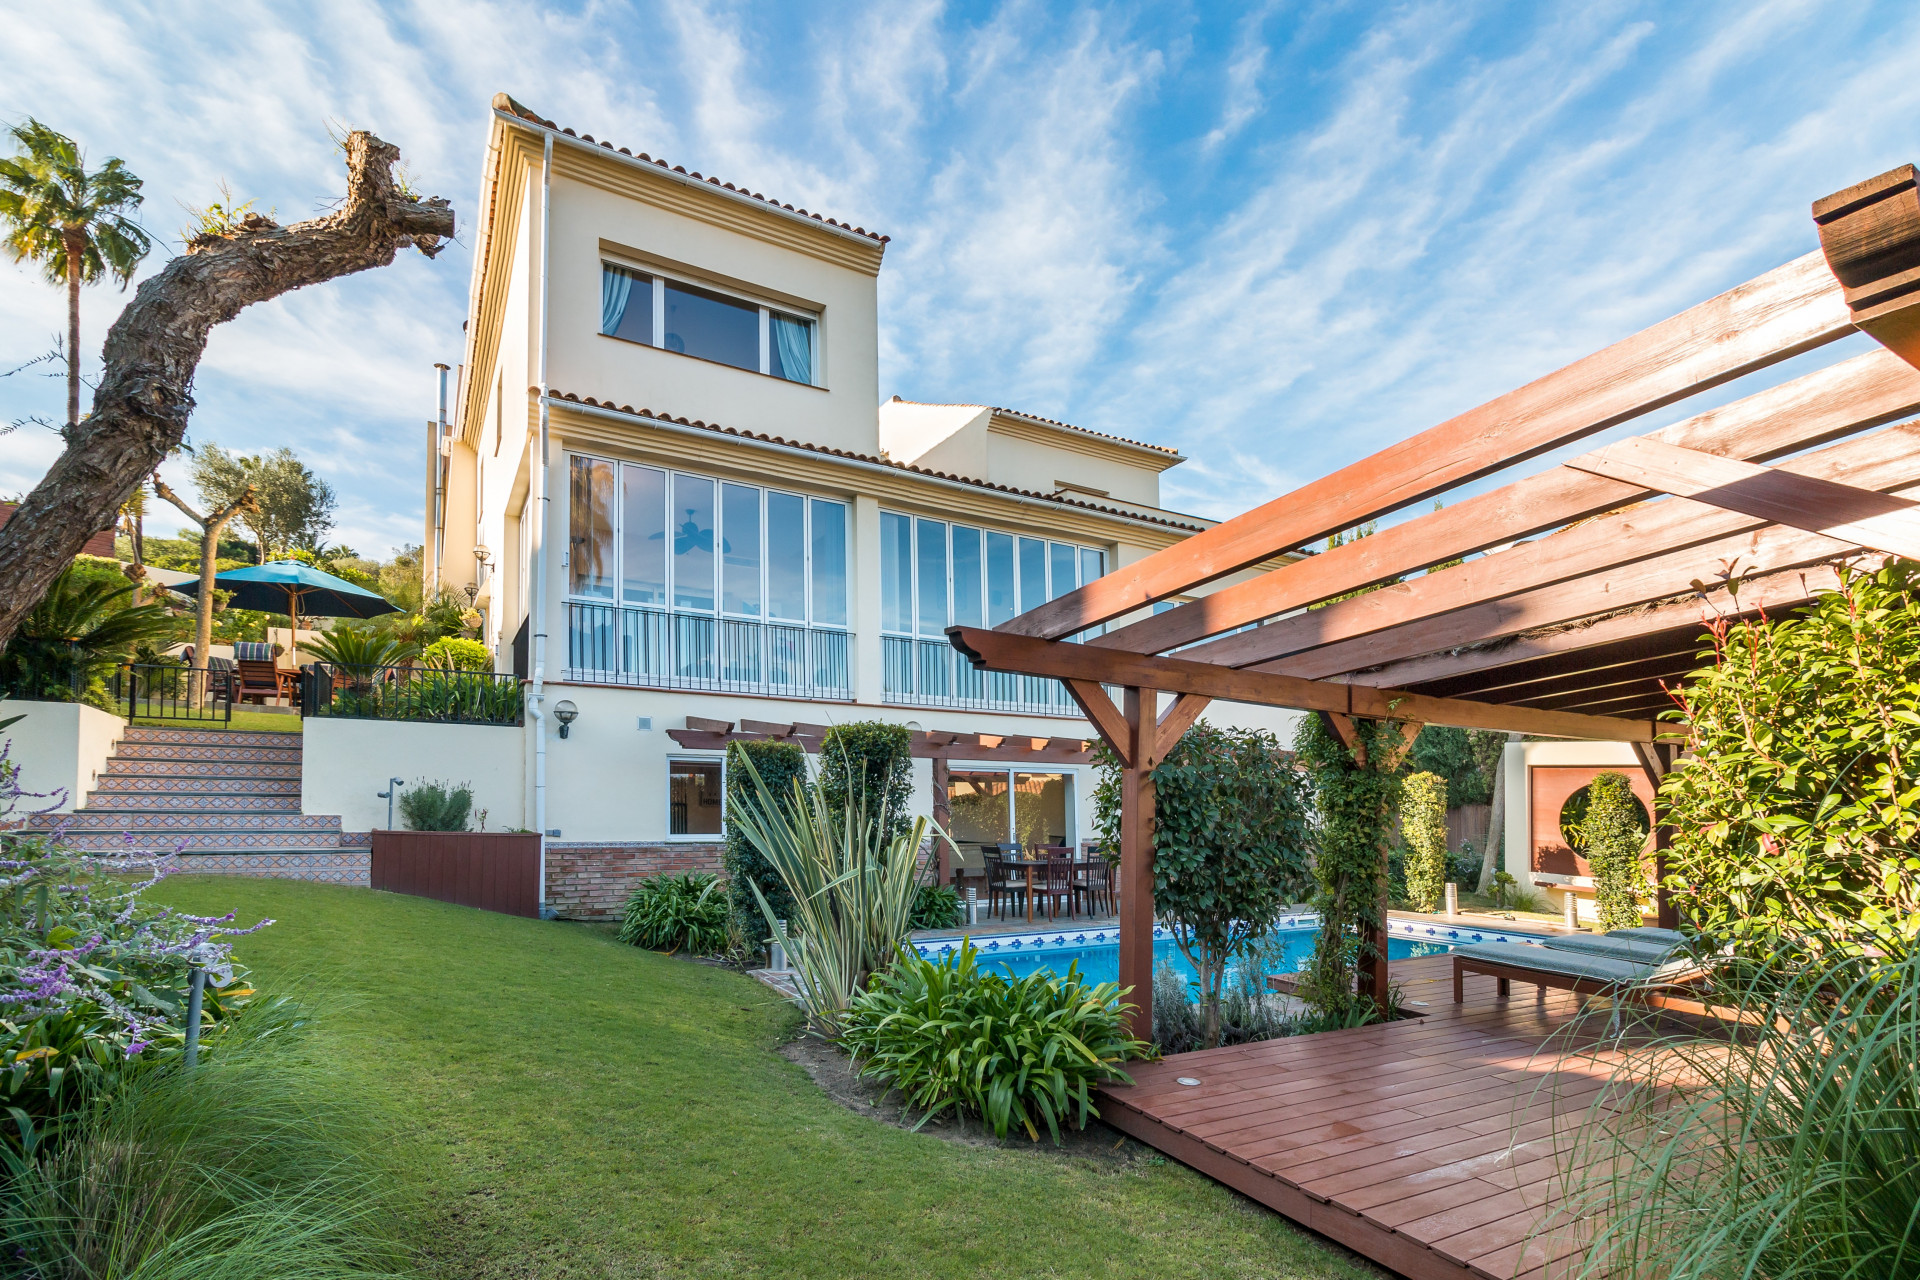 property for sale in sotogrande alto